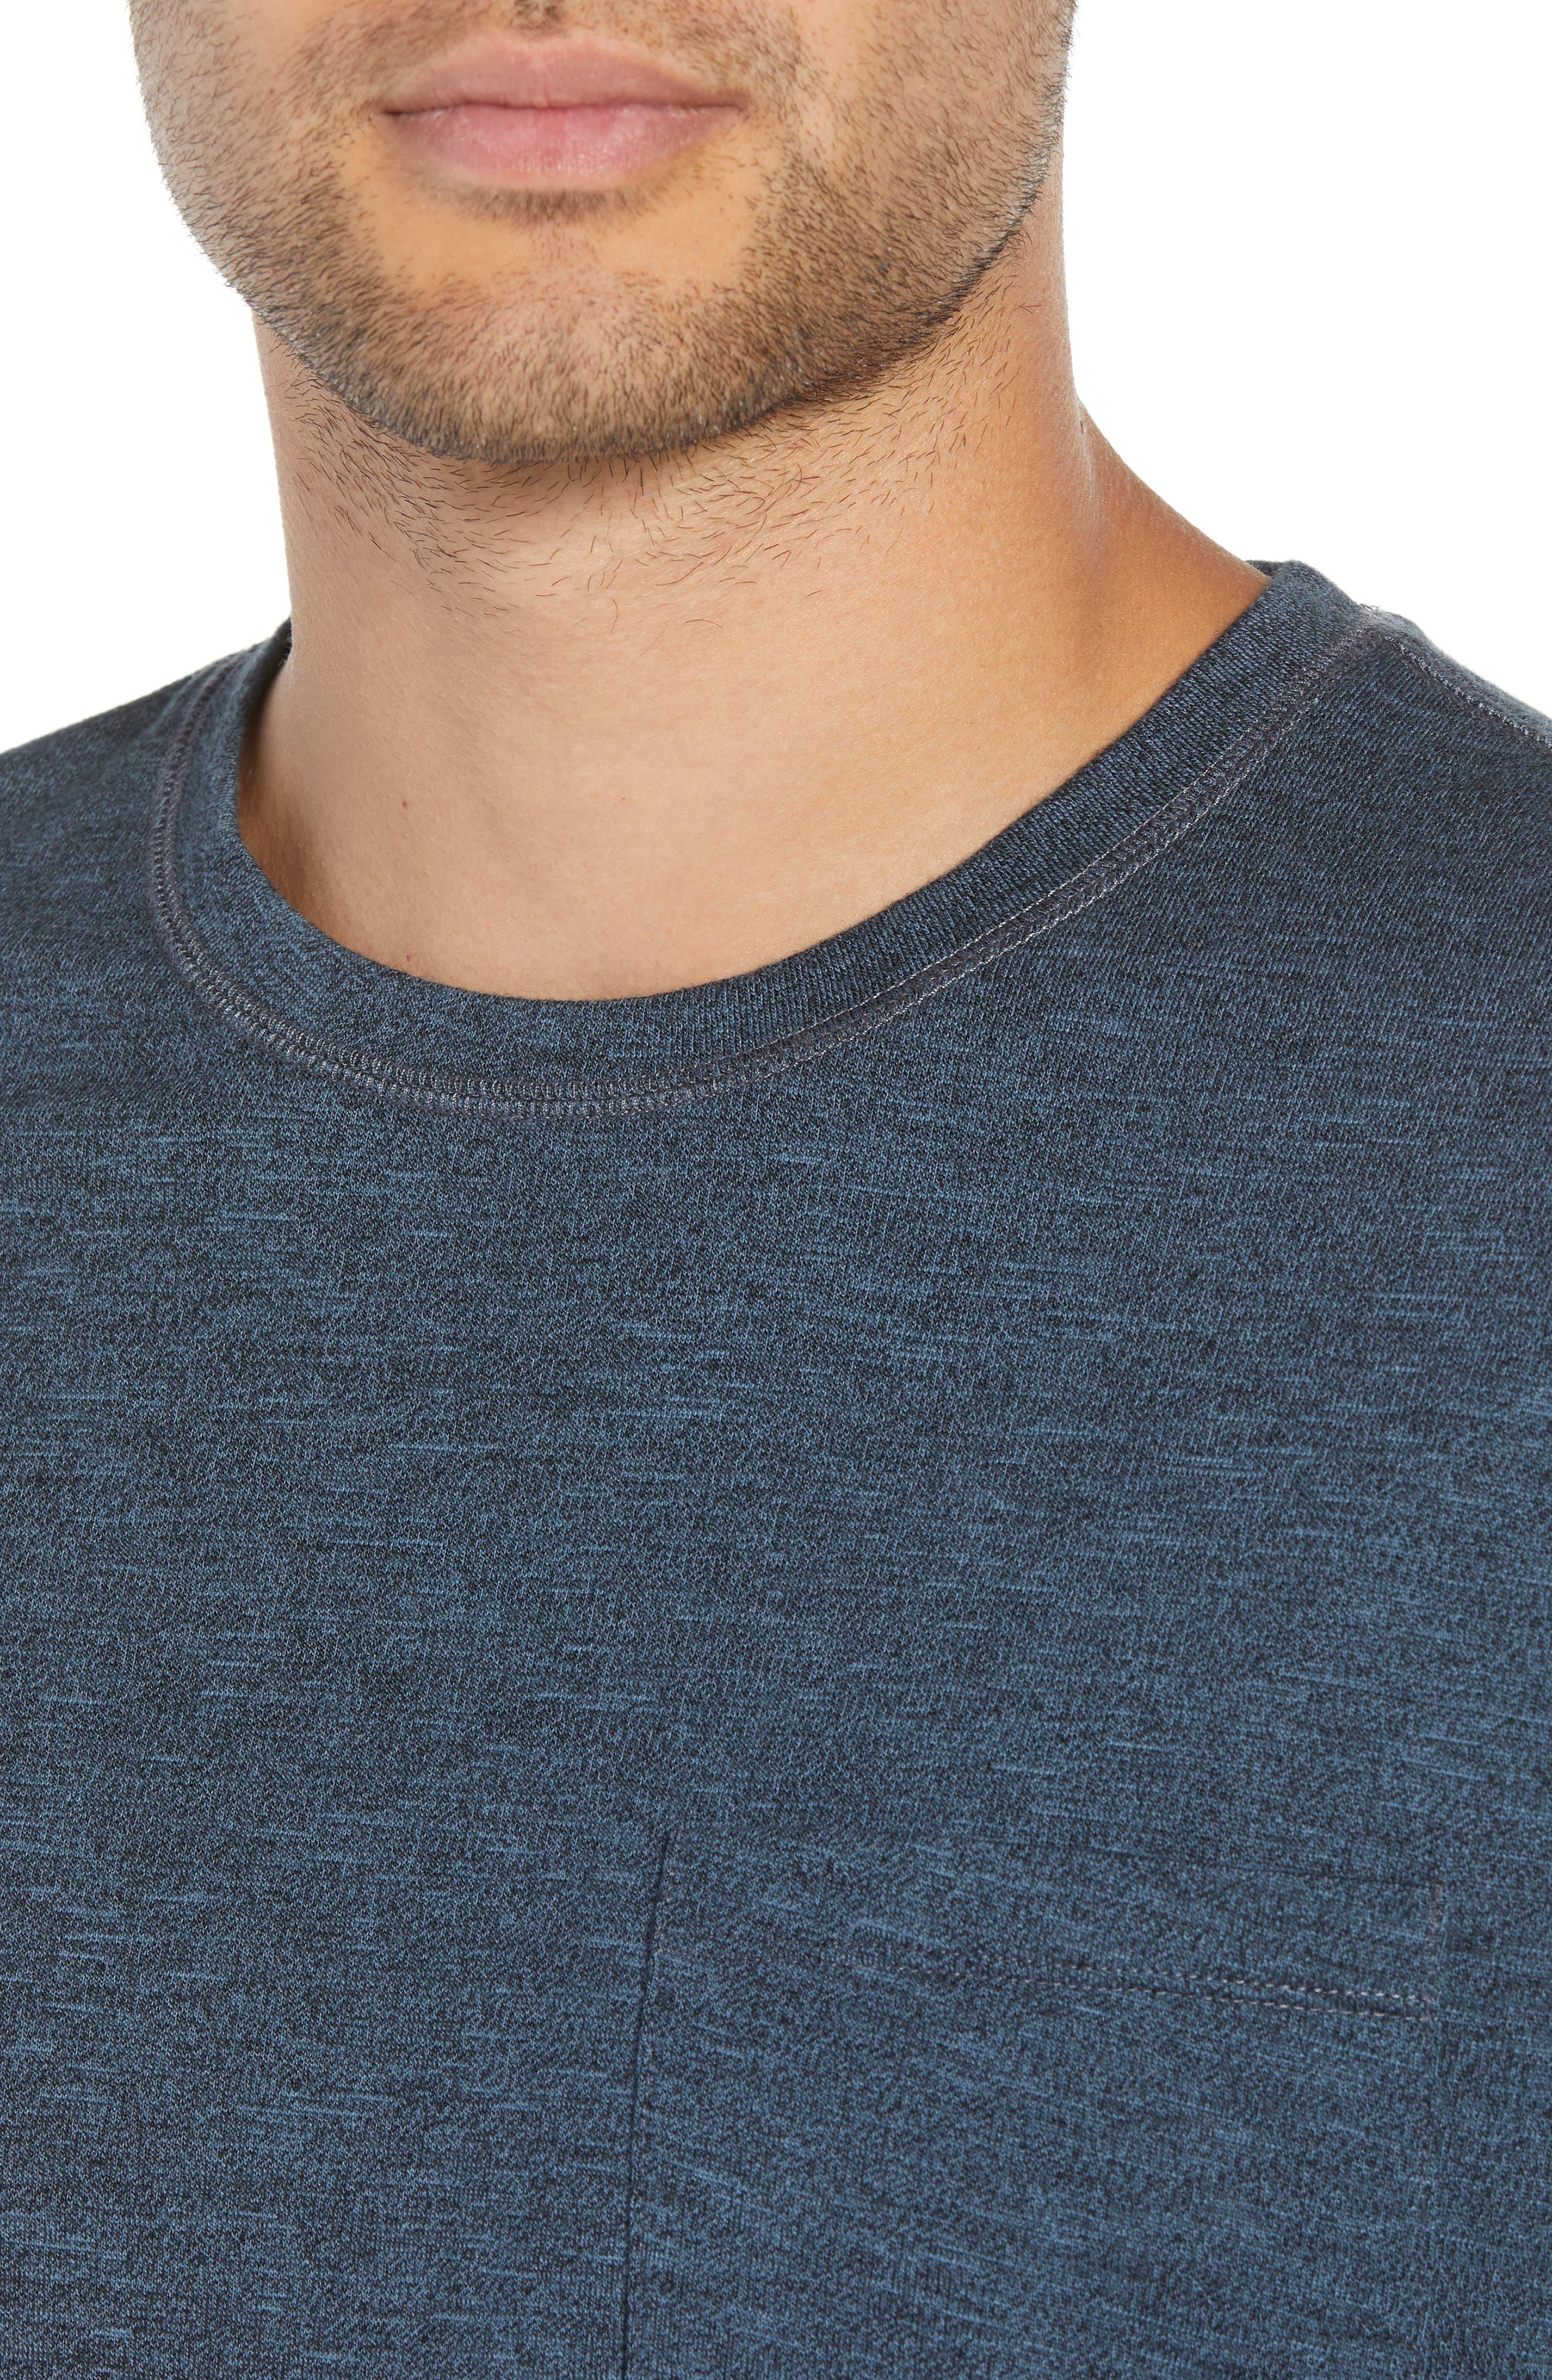 Classic Fit Pocket T-Shirt,                             Alternate thumbnail 4, color,                             400